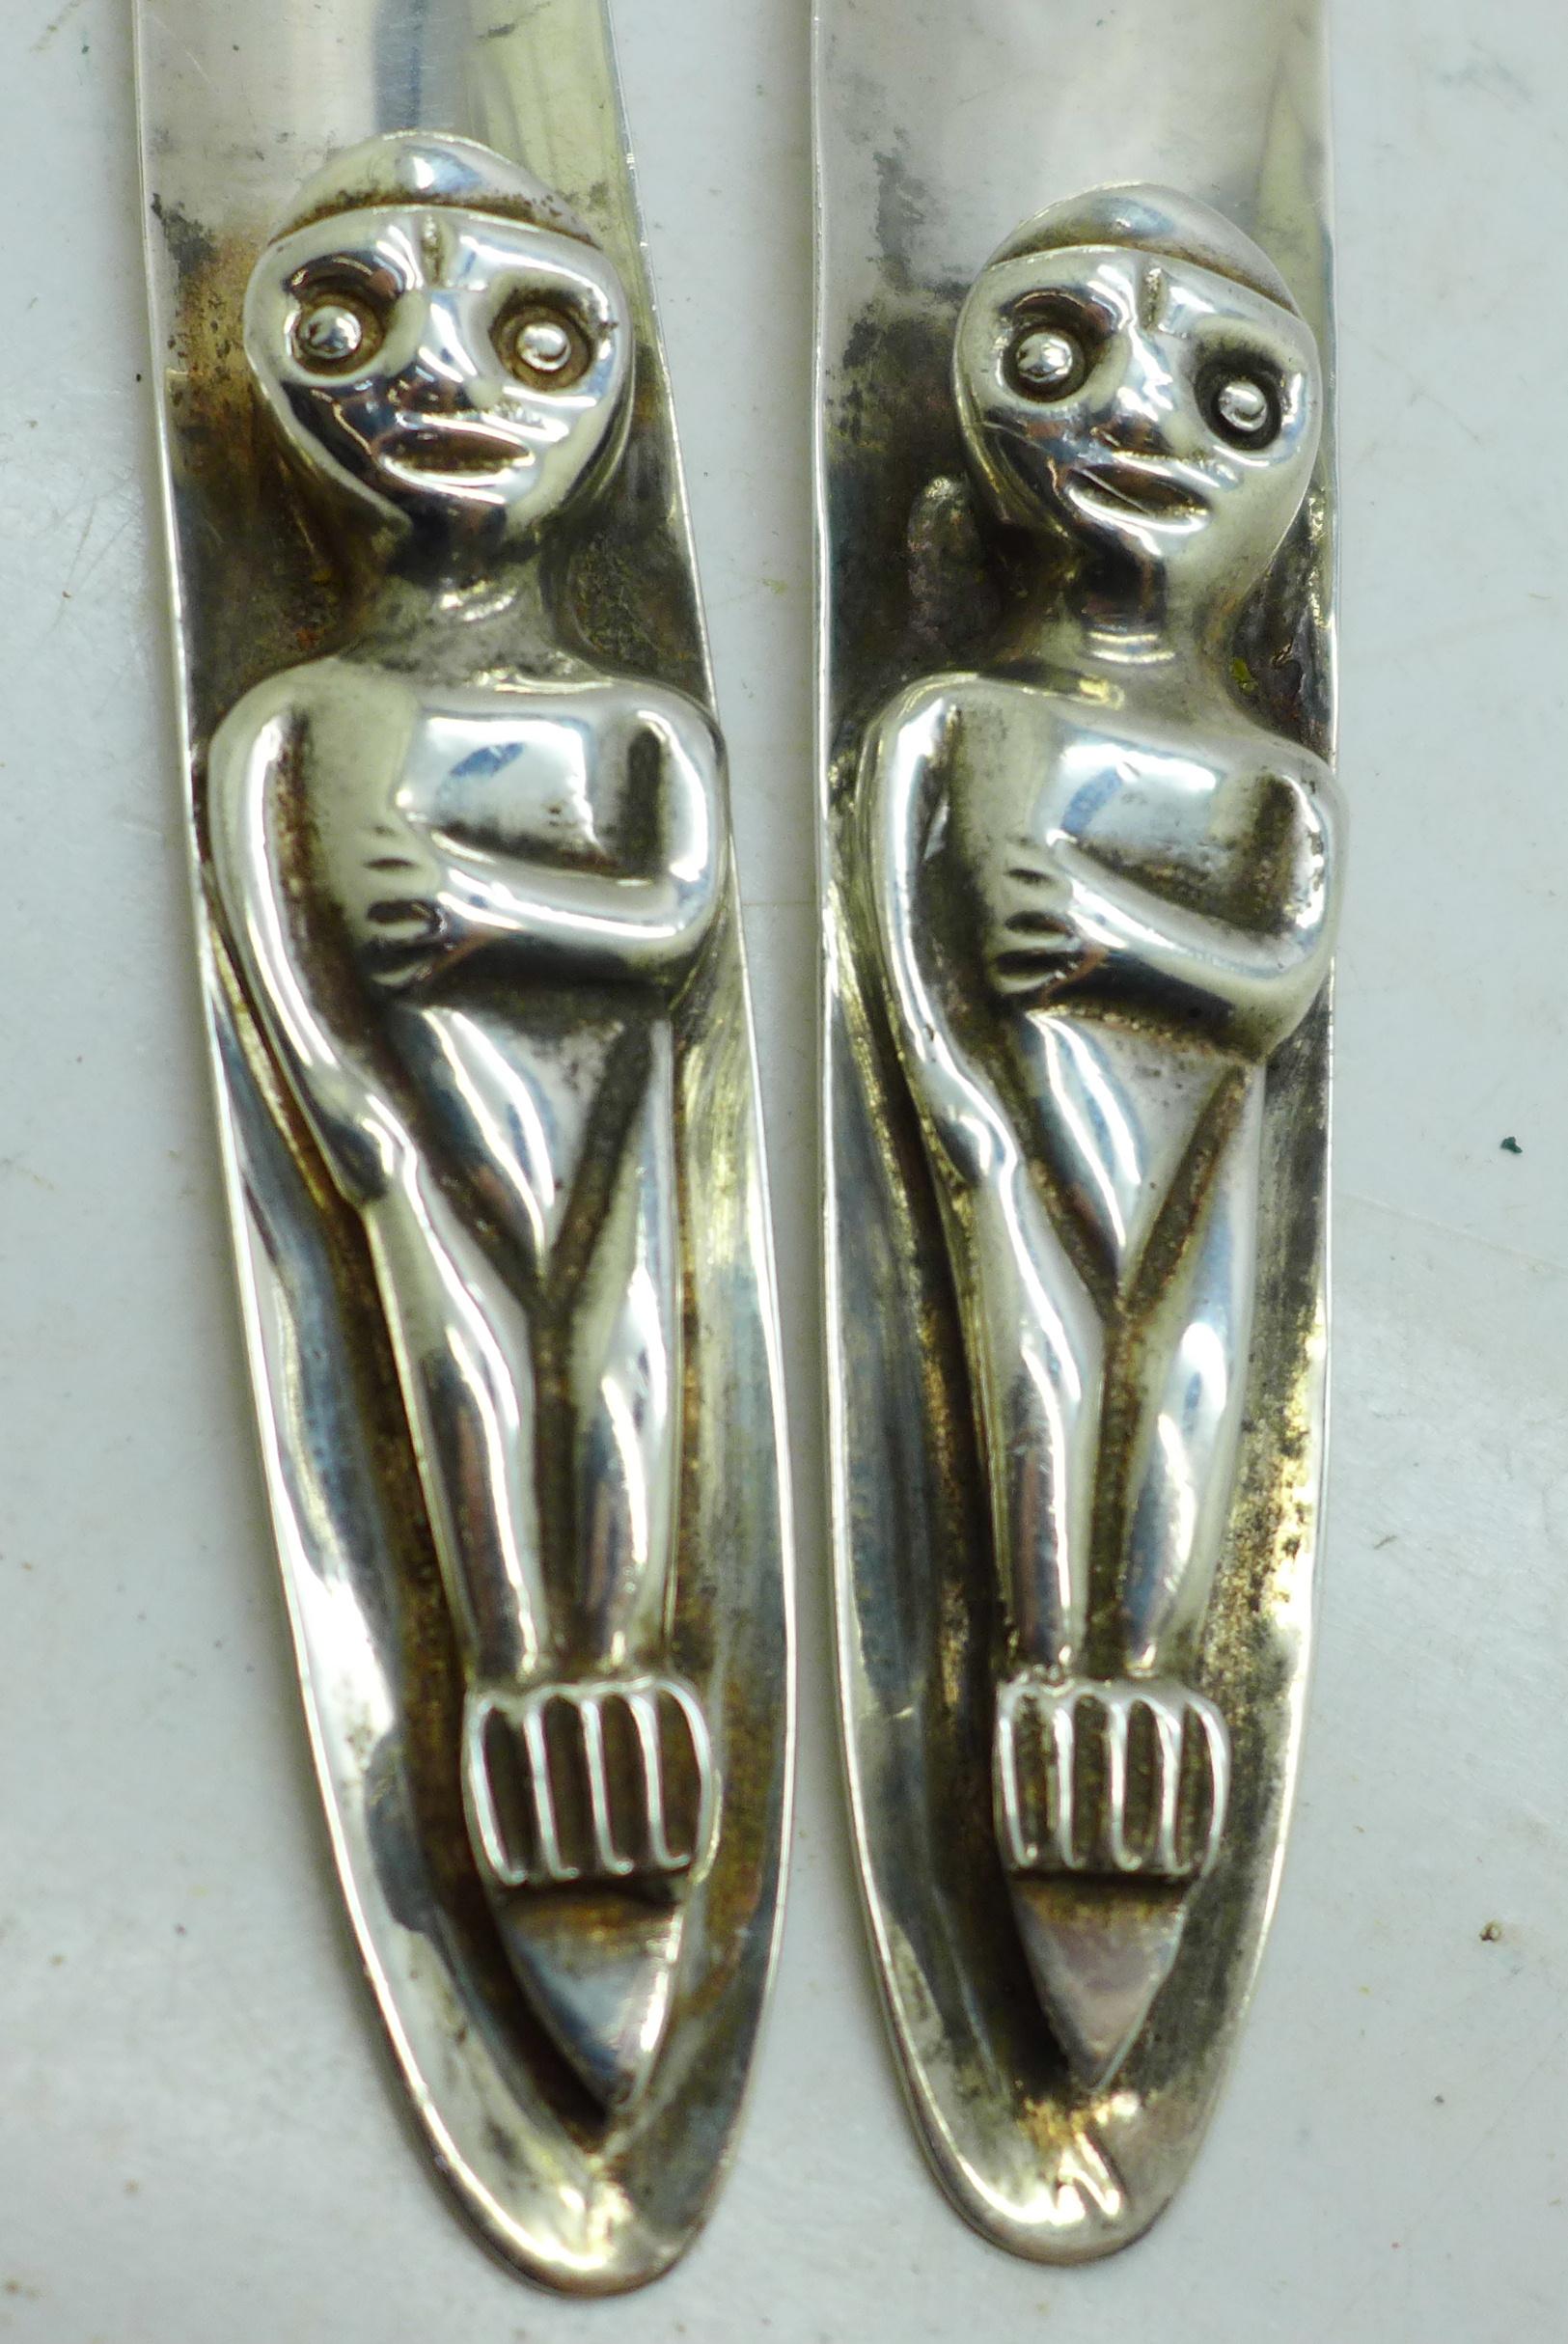 Two Canadian hammered Haida utensils, marked Acme Van. B.C. - Image 2 of 2